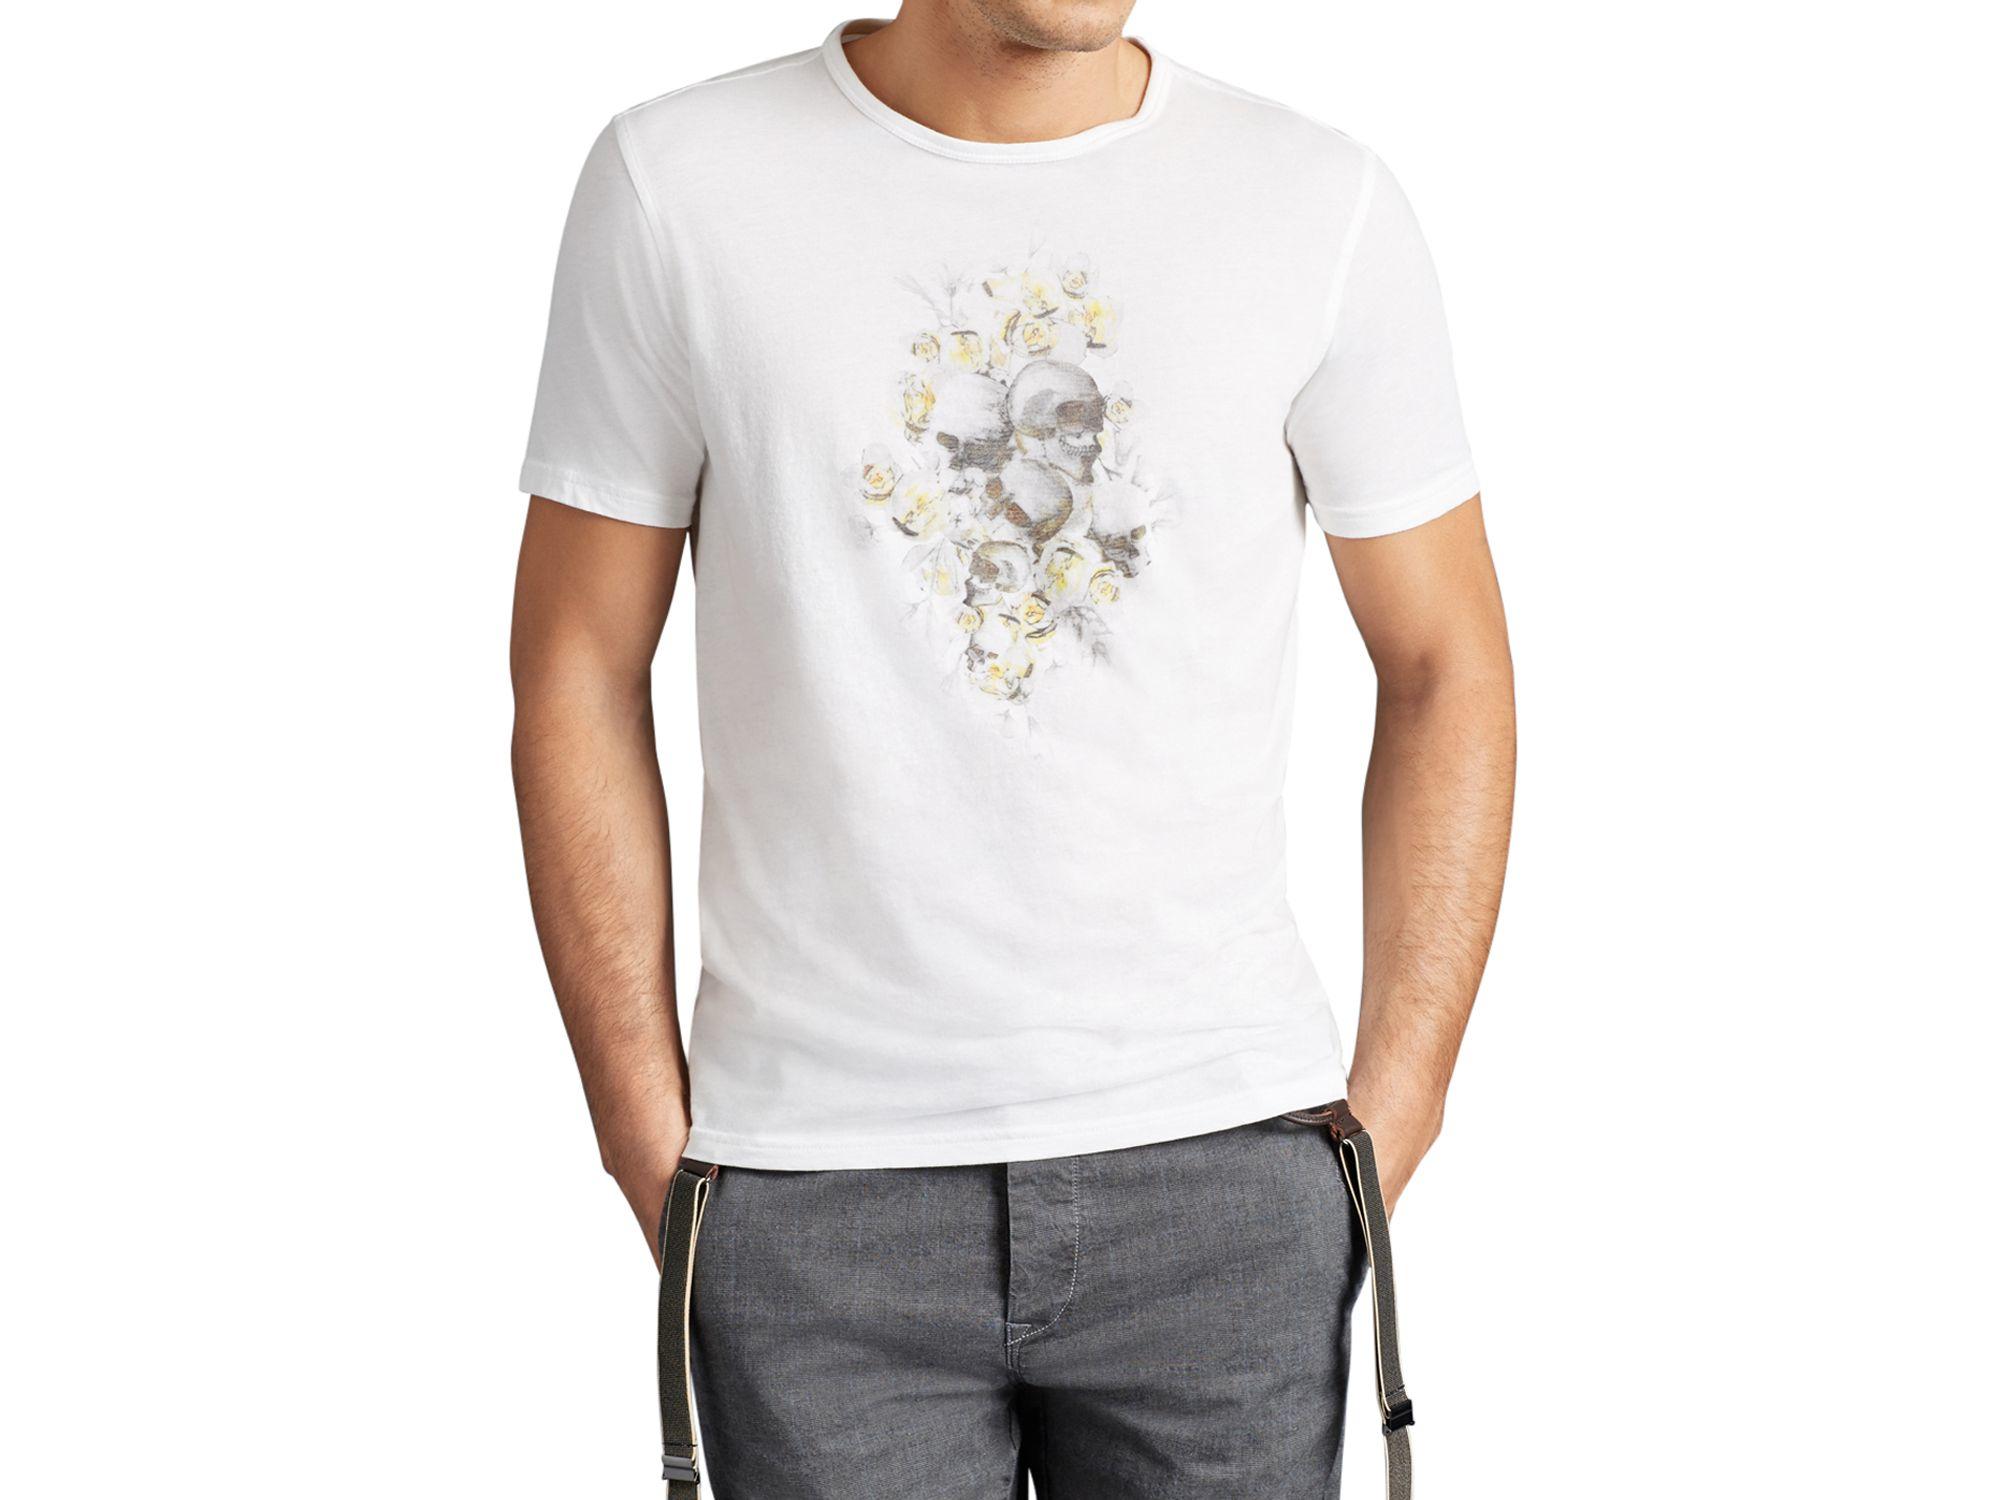 0d186a760 John Varvatos John Varvatos Star Floral Skull Graphic Tee in White ...